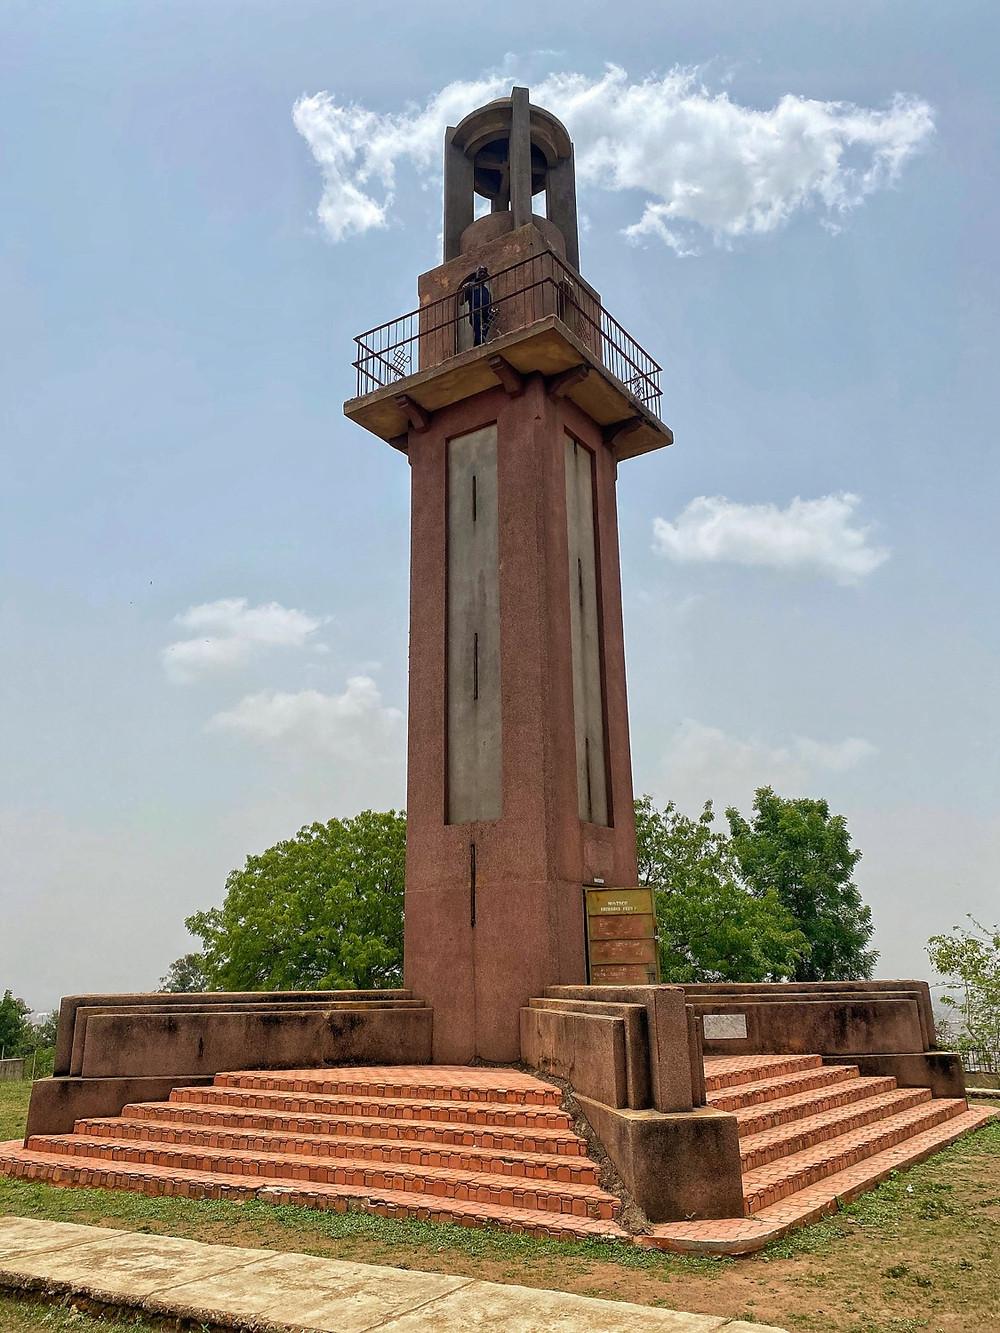 Bowers tower, Ibadan